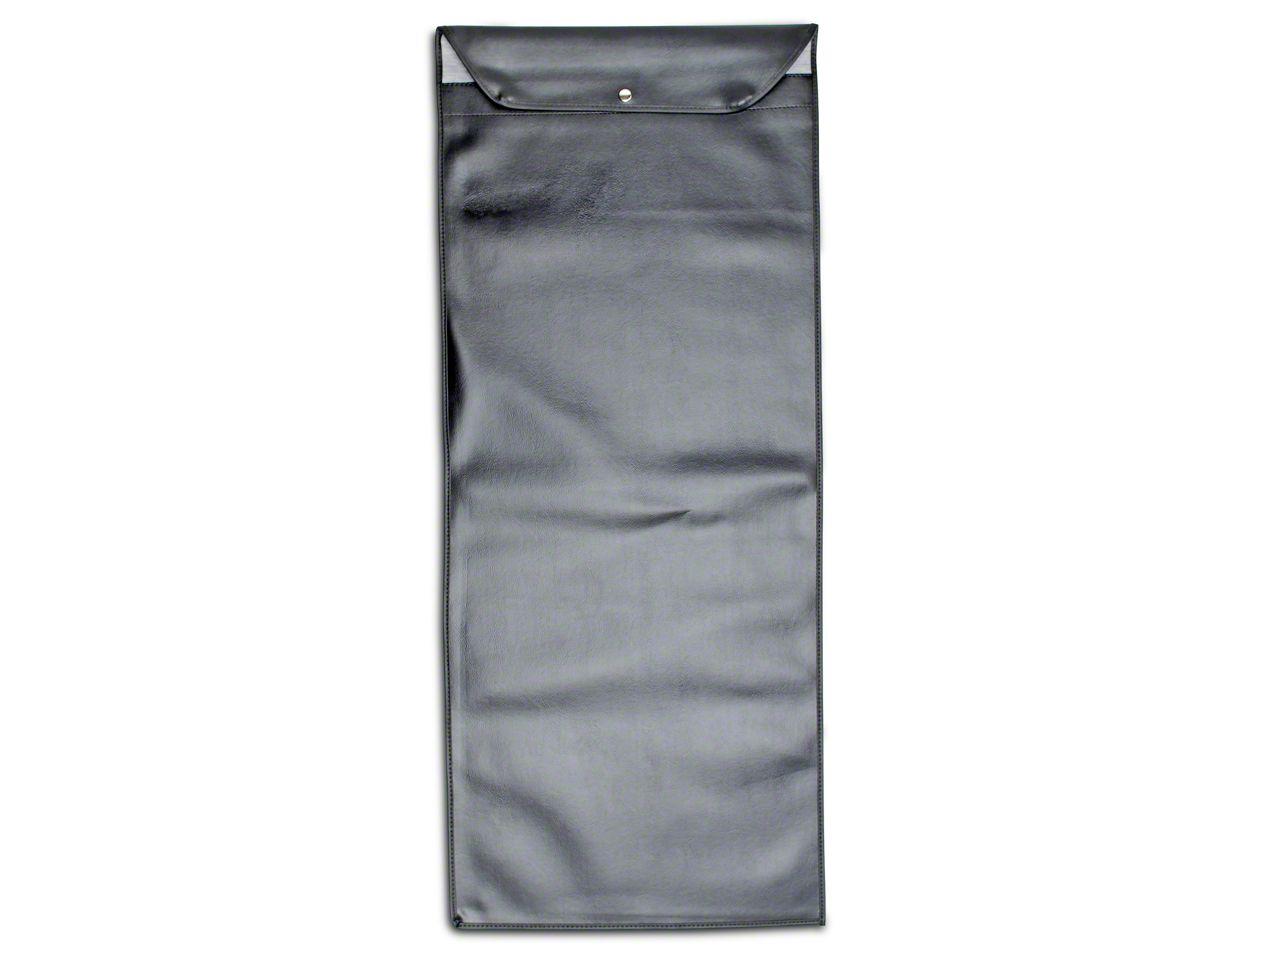 OPR Convertible Top Boot Bag (83-04 Convertible)